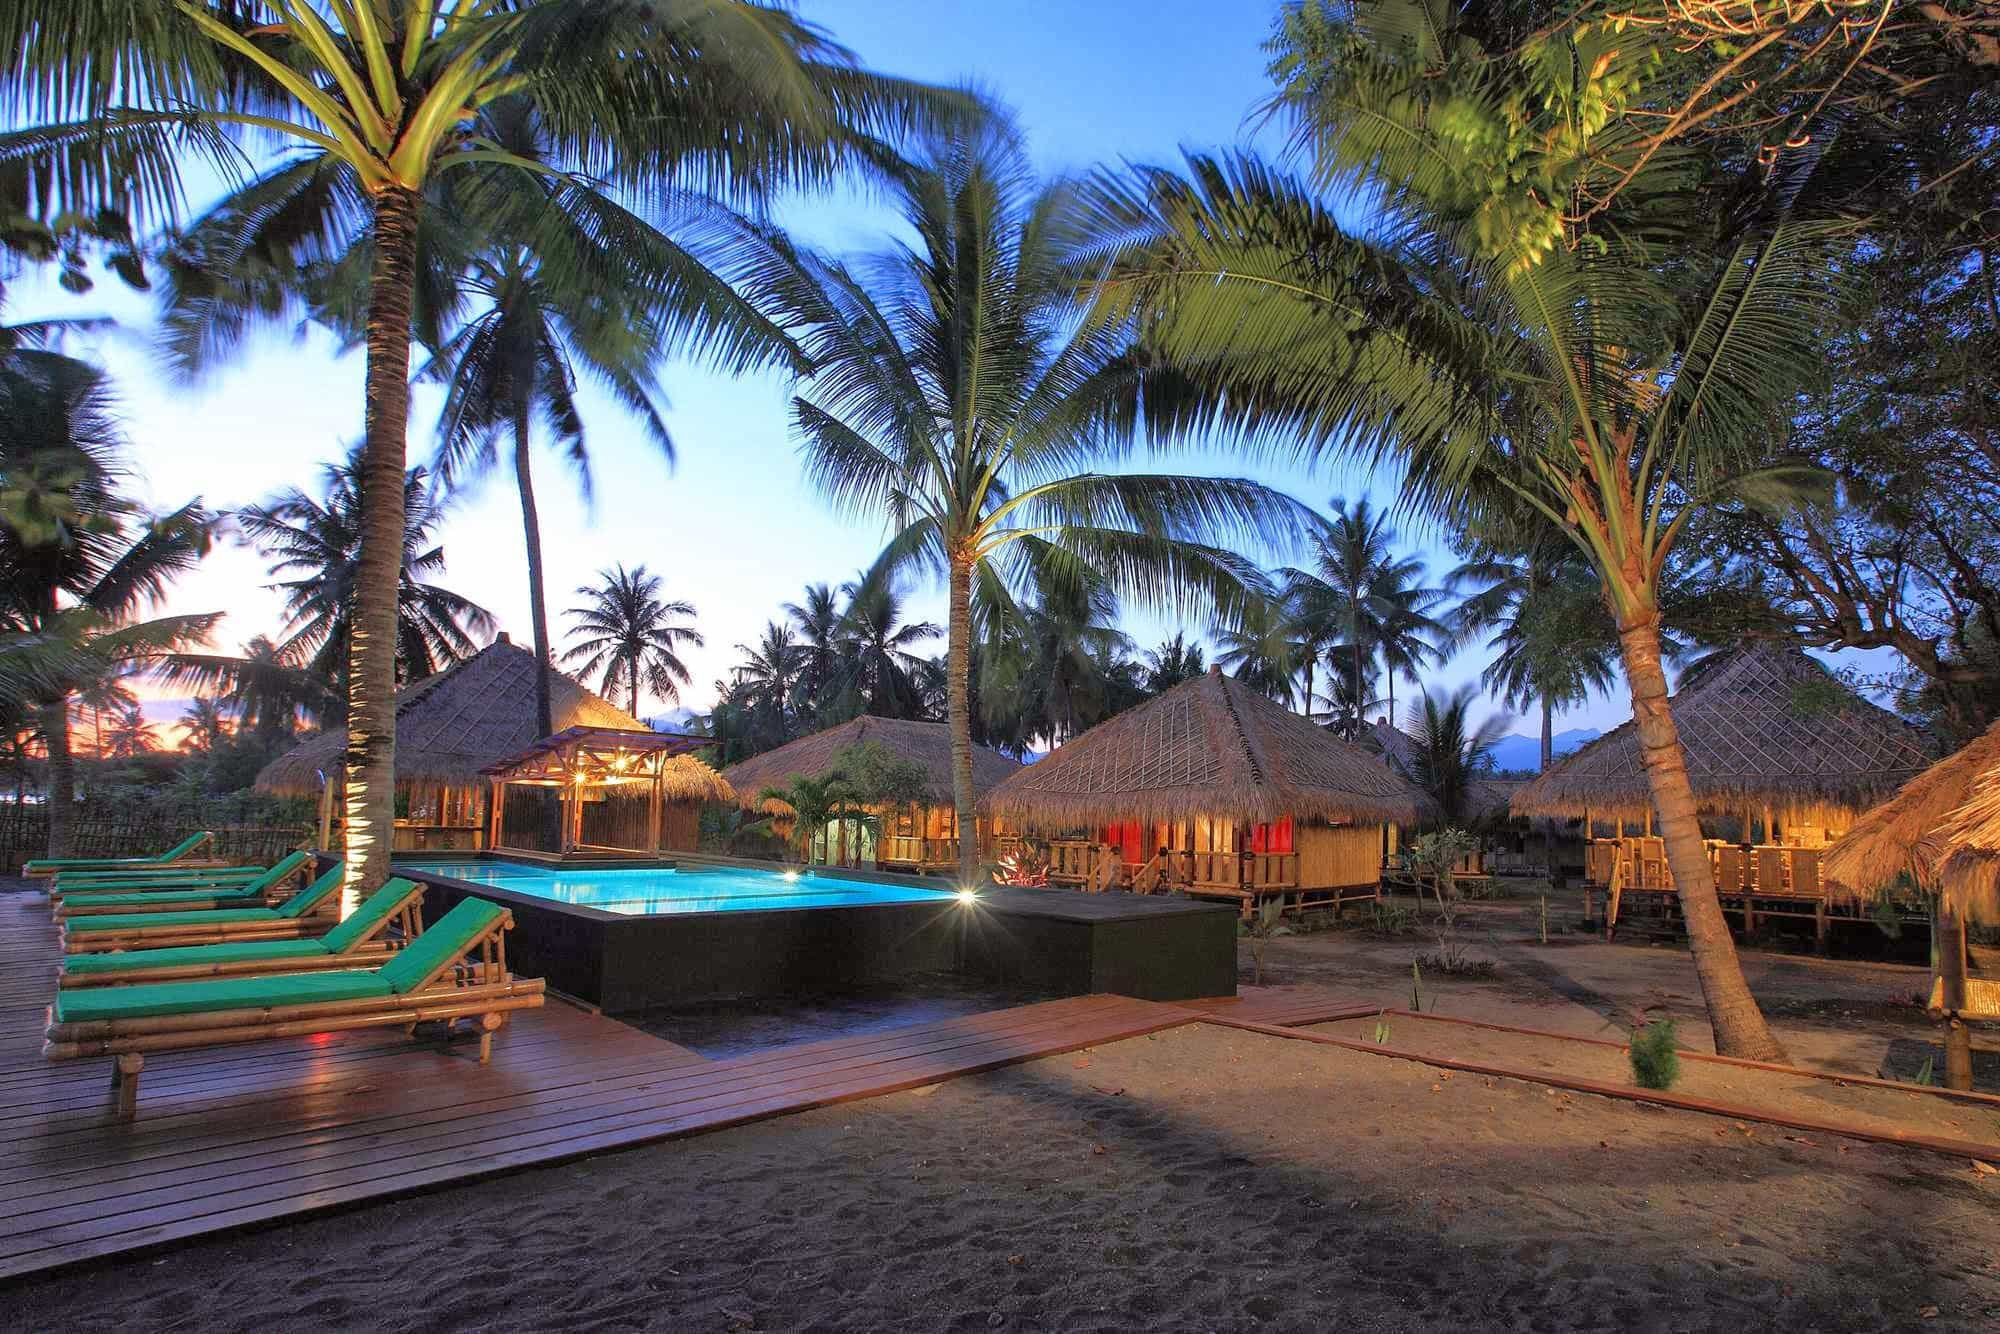 hotel rinjani lombok piscine et plage panorama